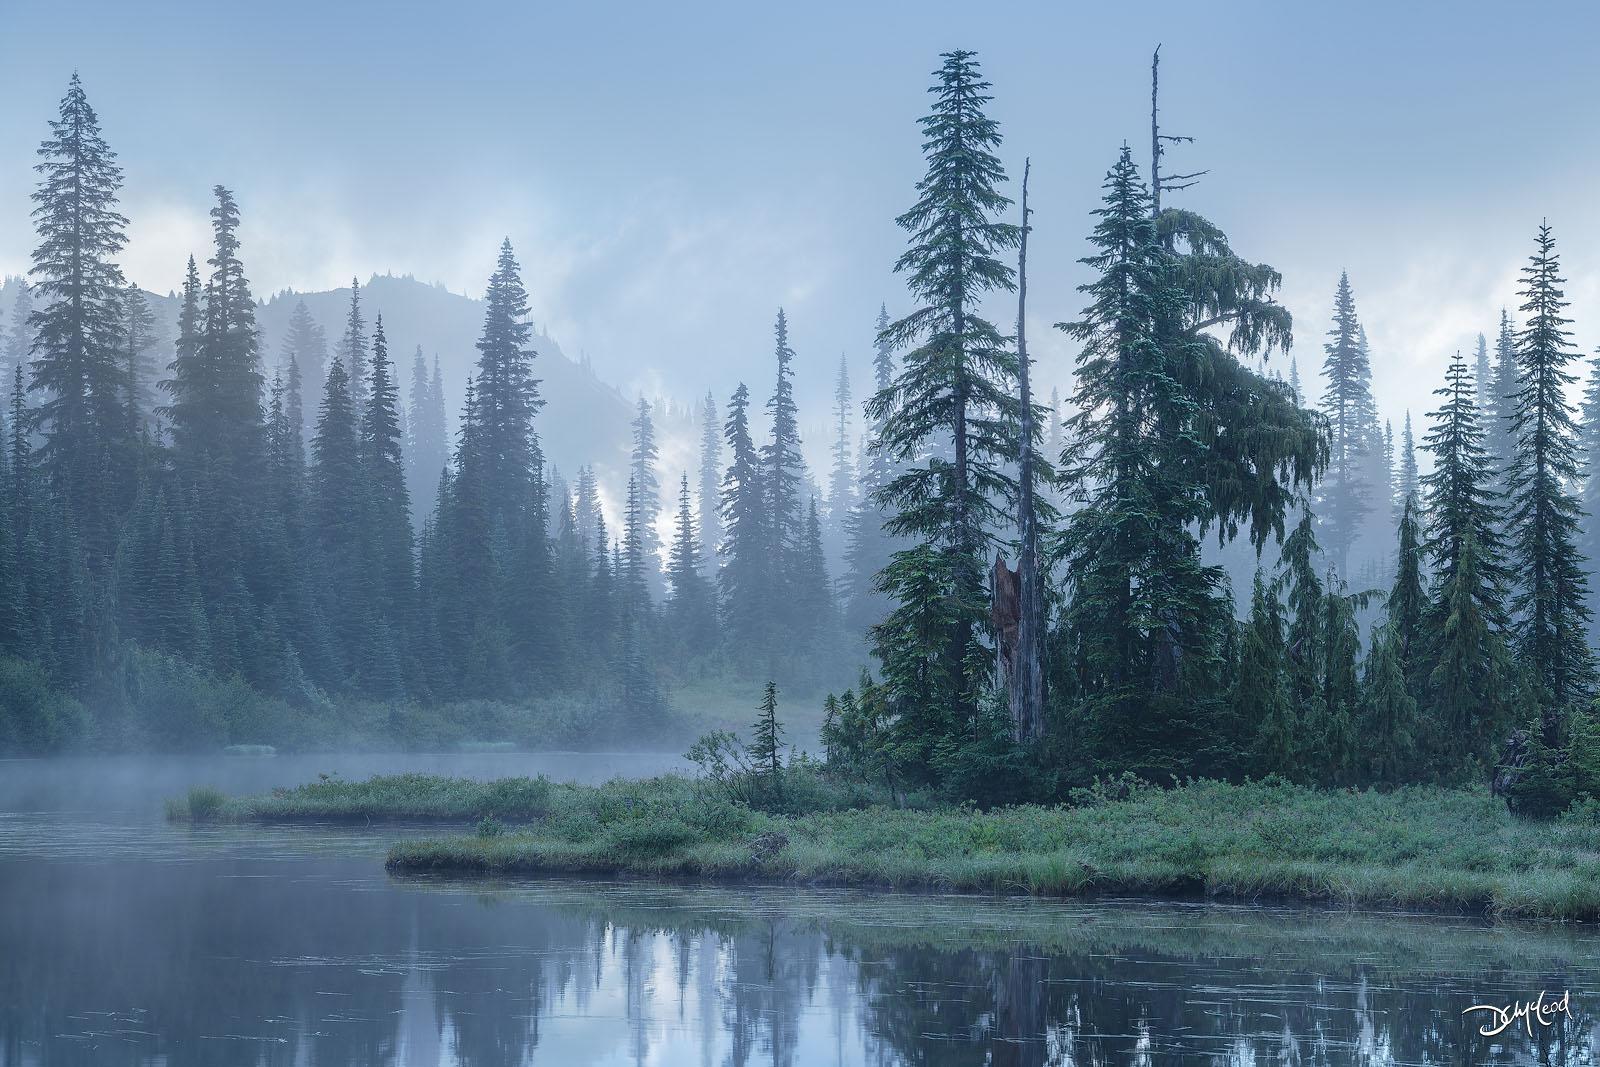 reflection lake, mount rainier, fog, trees, photo